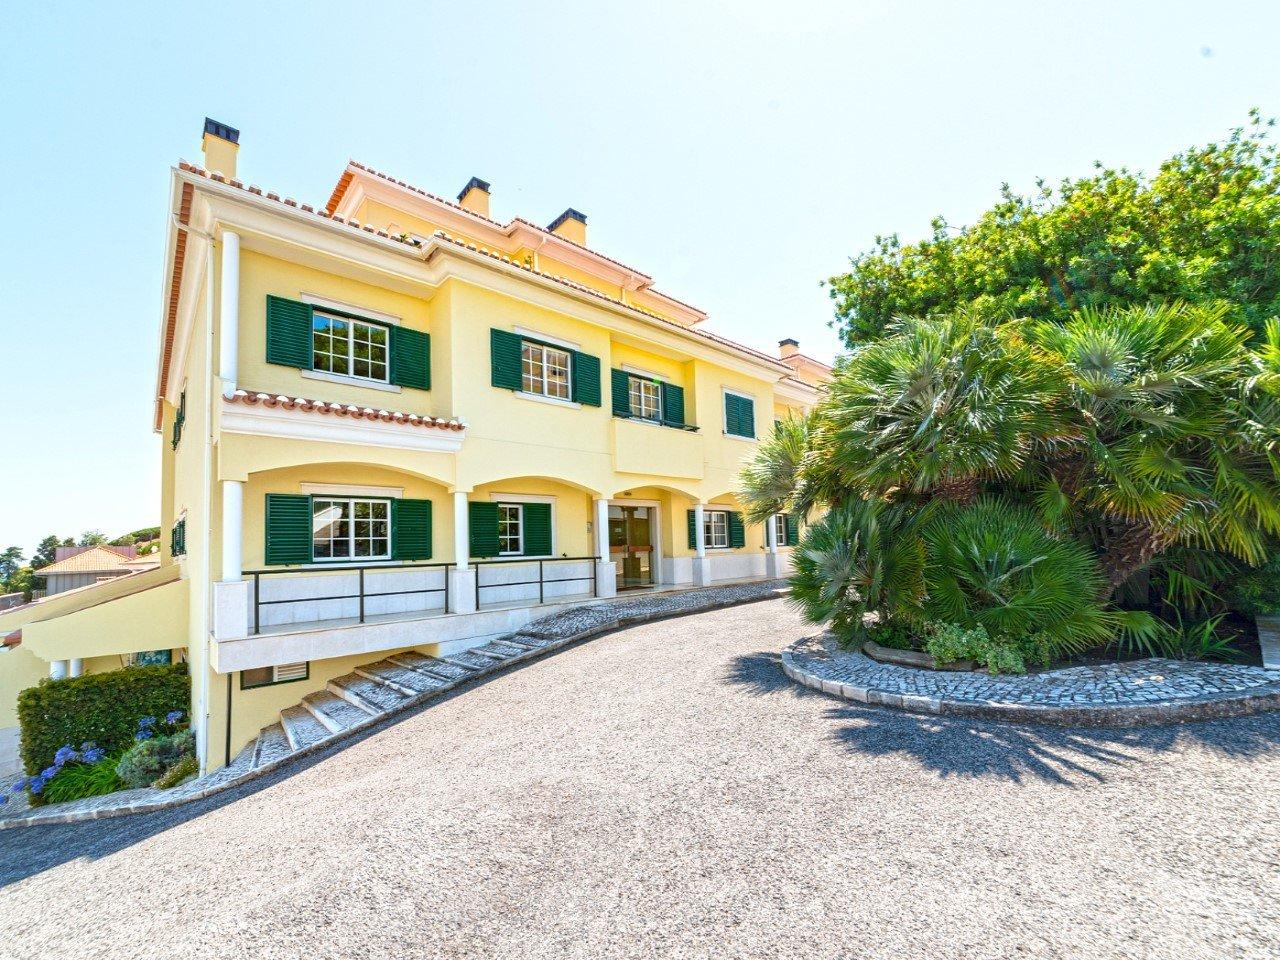 4 Bedroom Apartment Cascais, Lisbon Ref: AMA14147